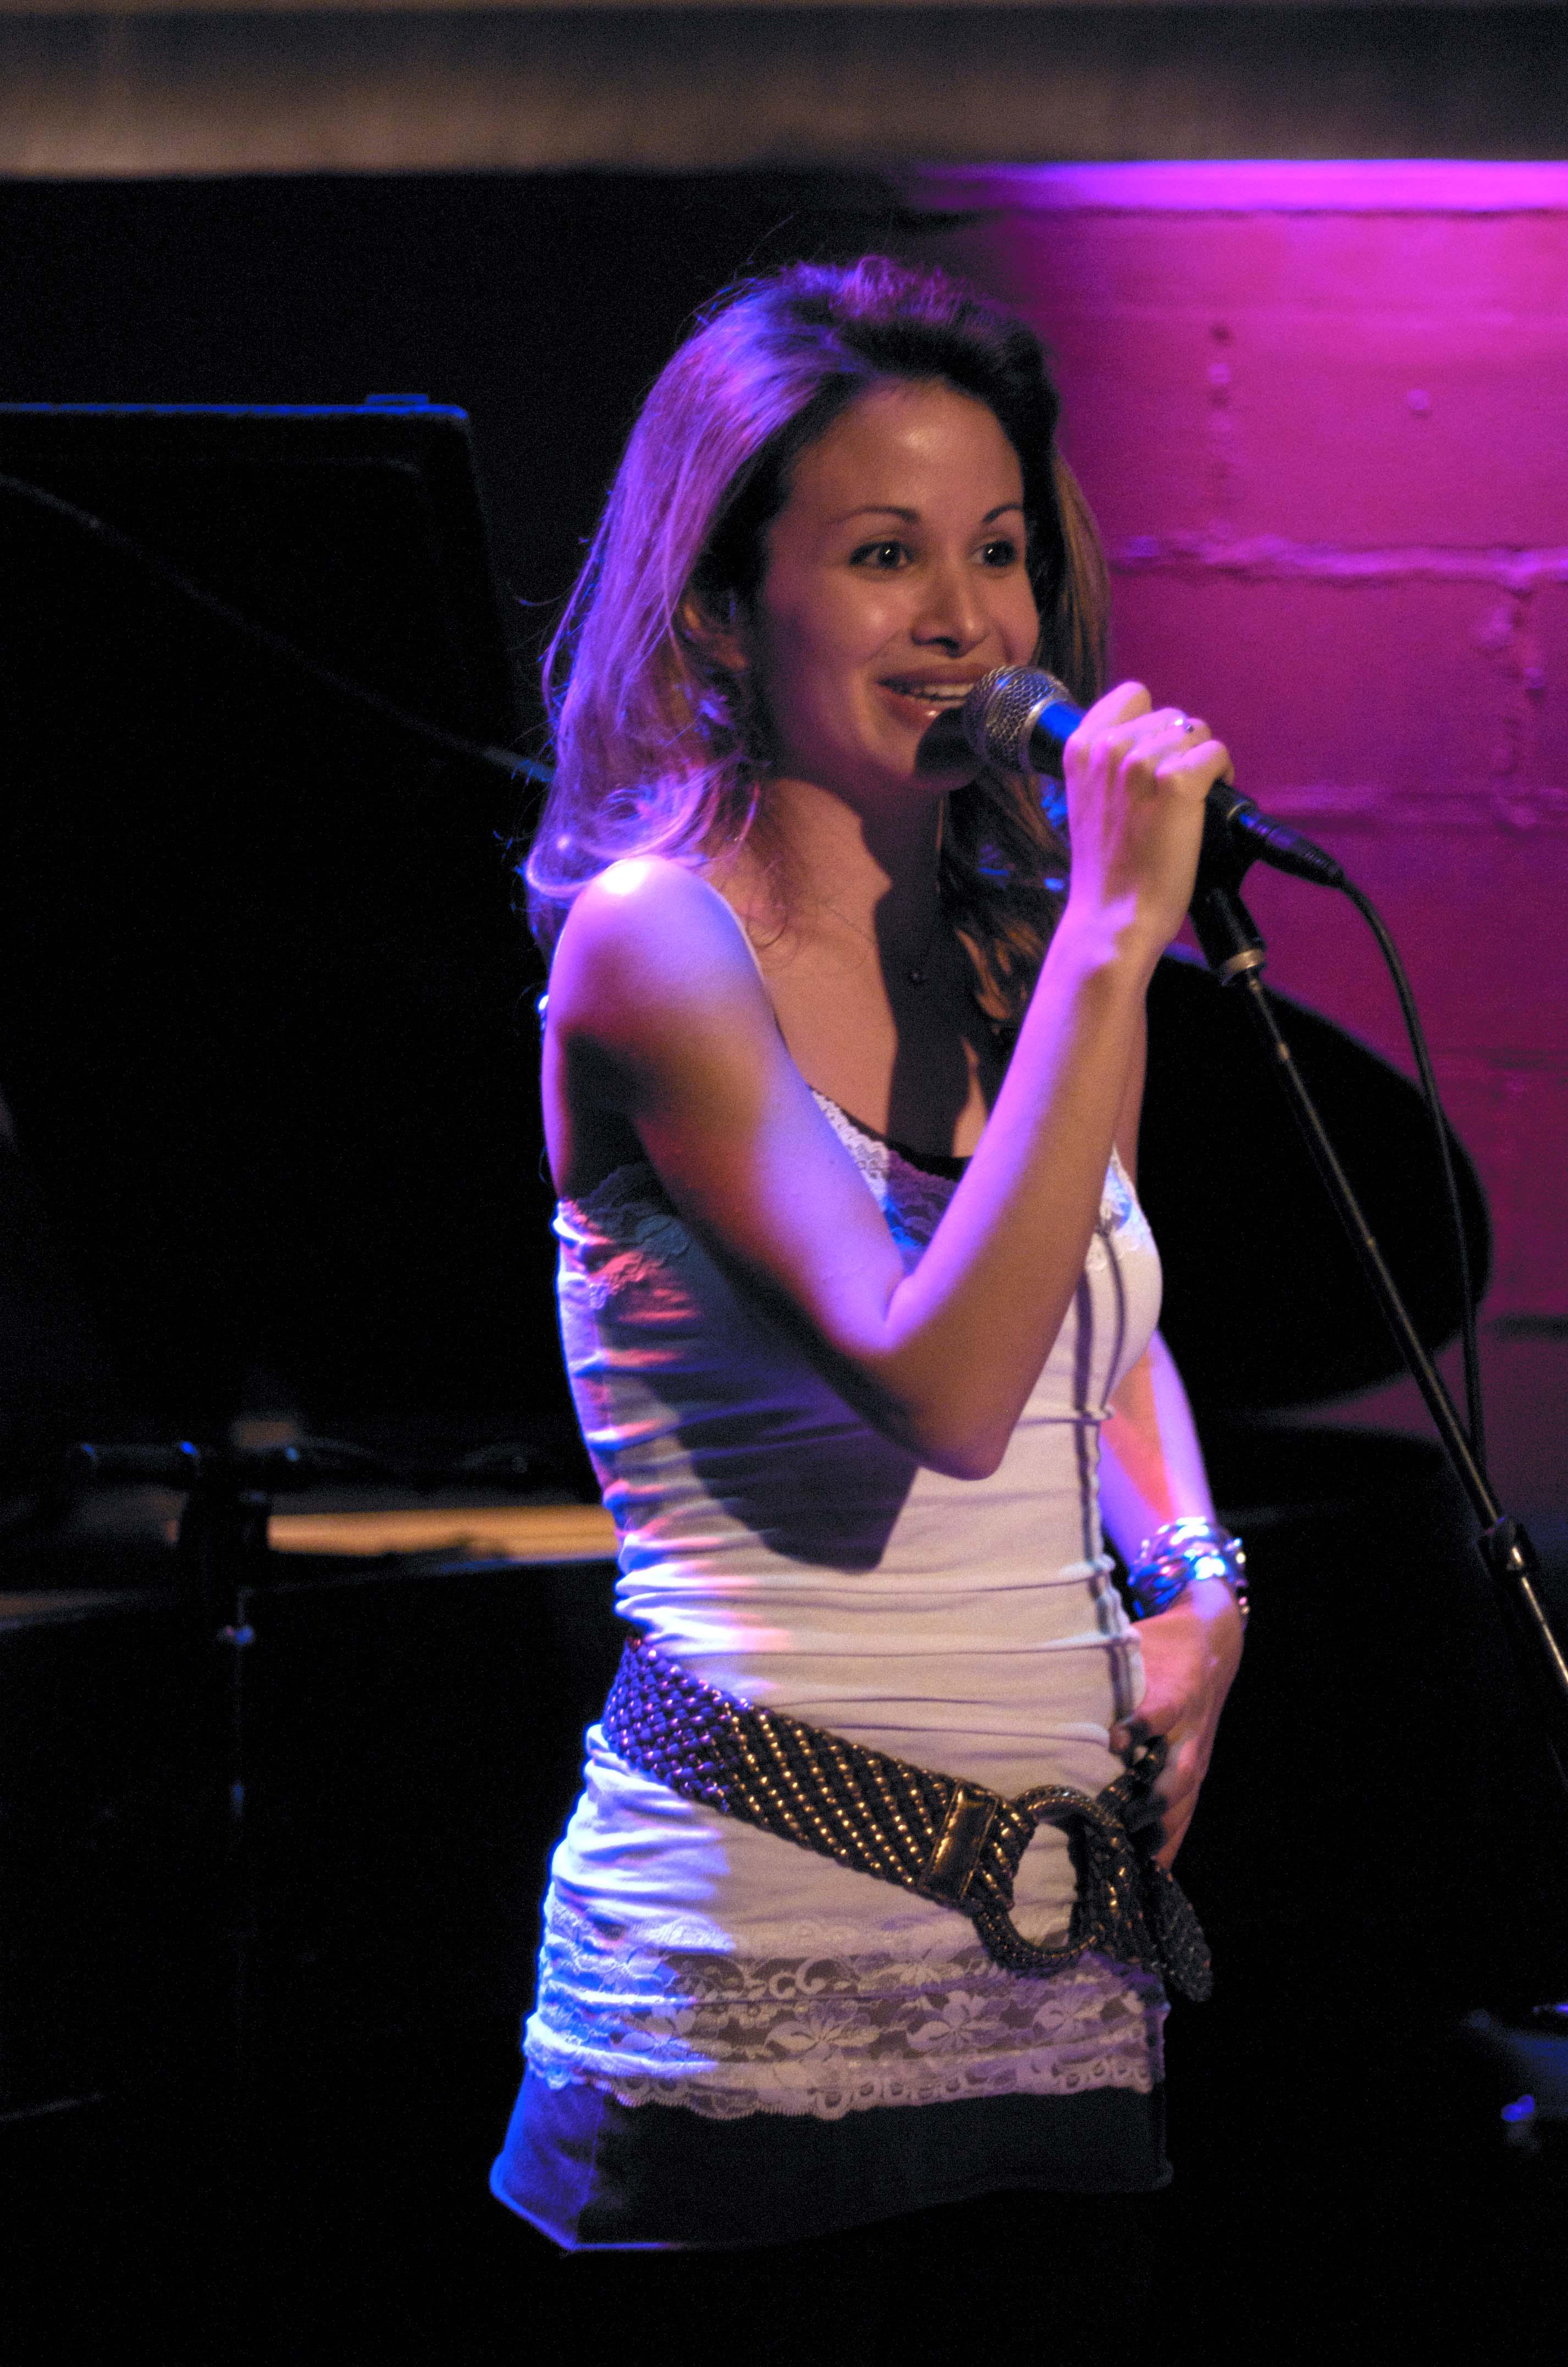 Chloe Temtchine